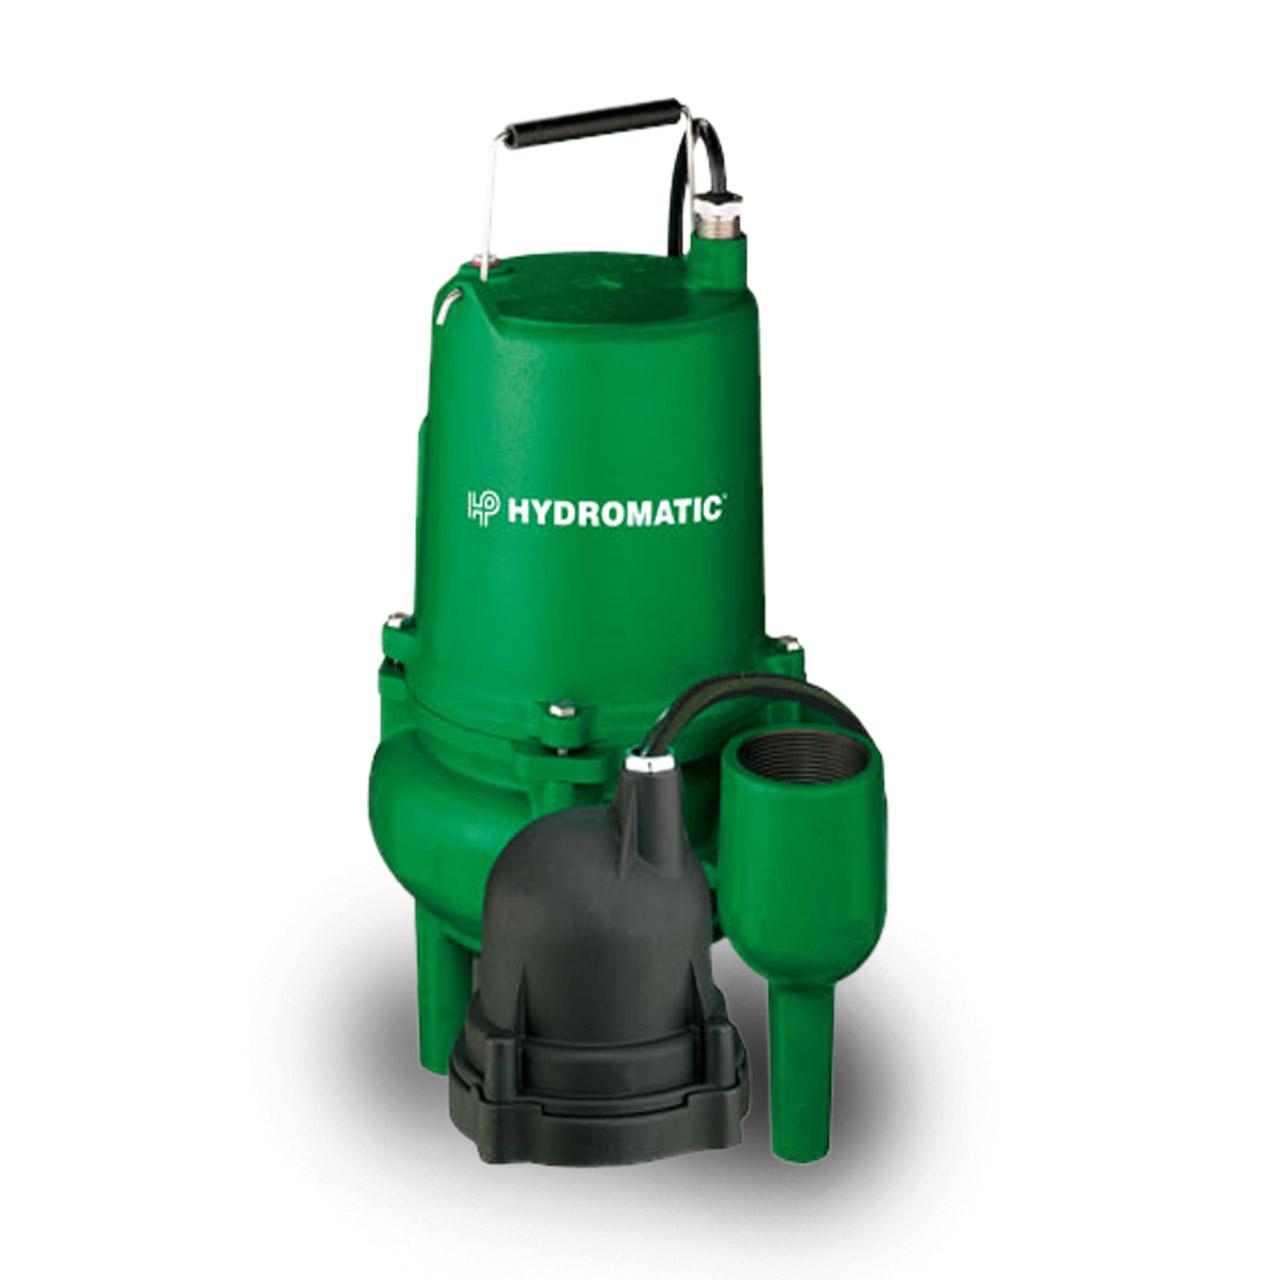 Hydromatic Pump Hydromatic Sp40a1 Submersible Sewage